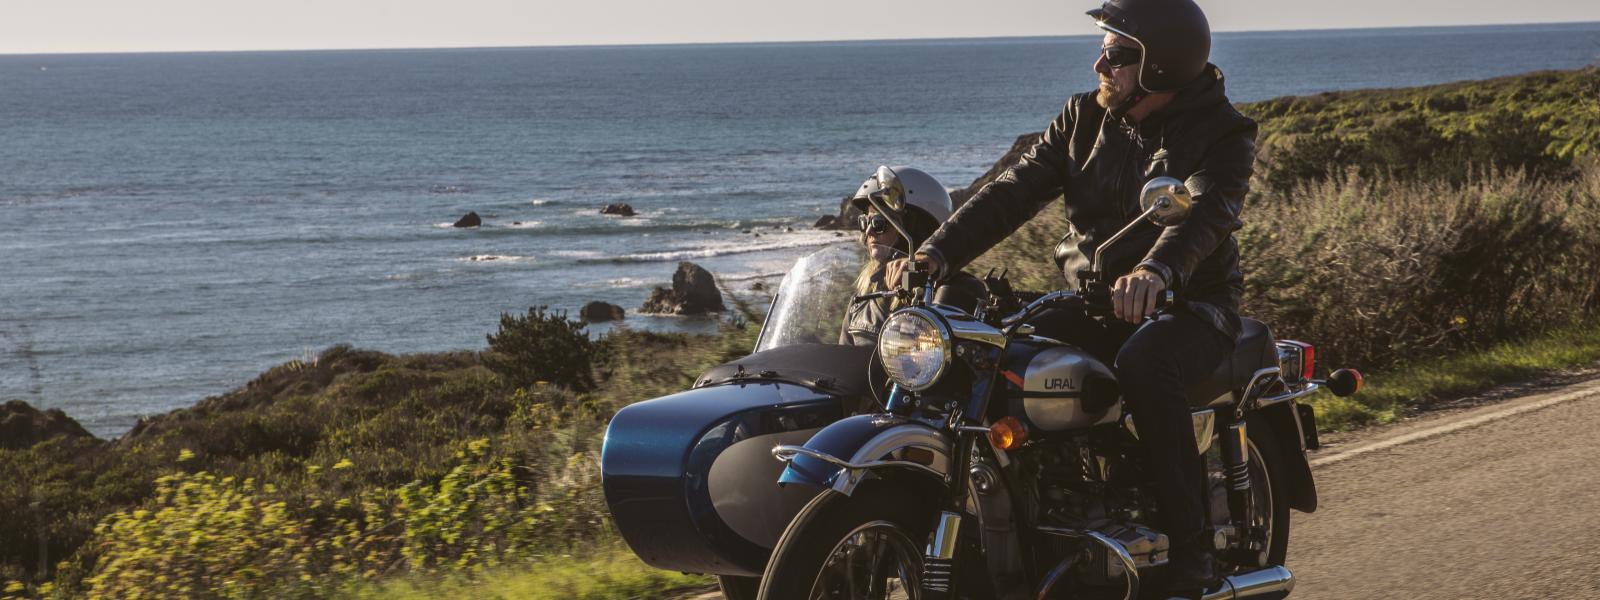 Highway1_Motorcycle4_3046